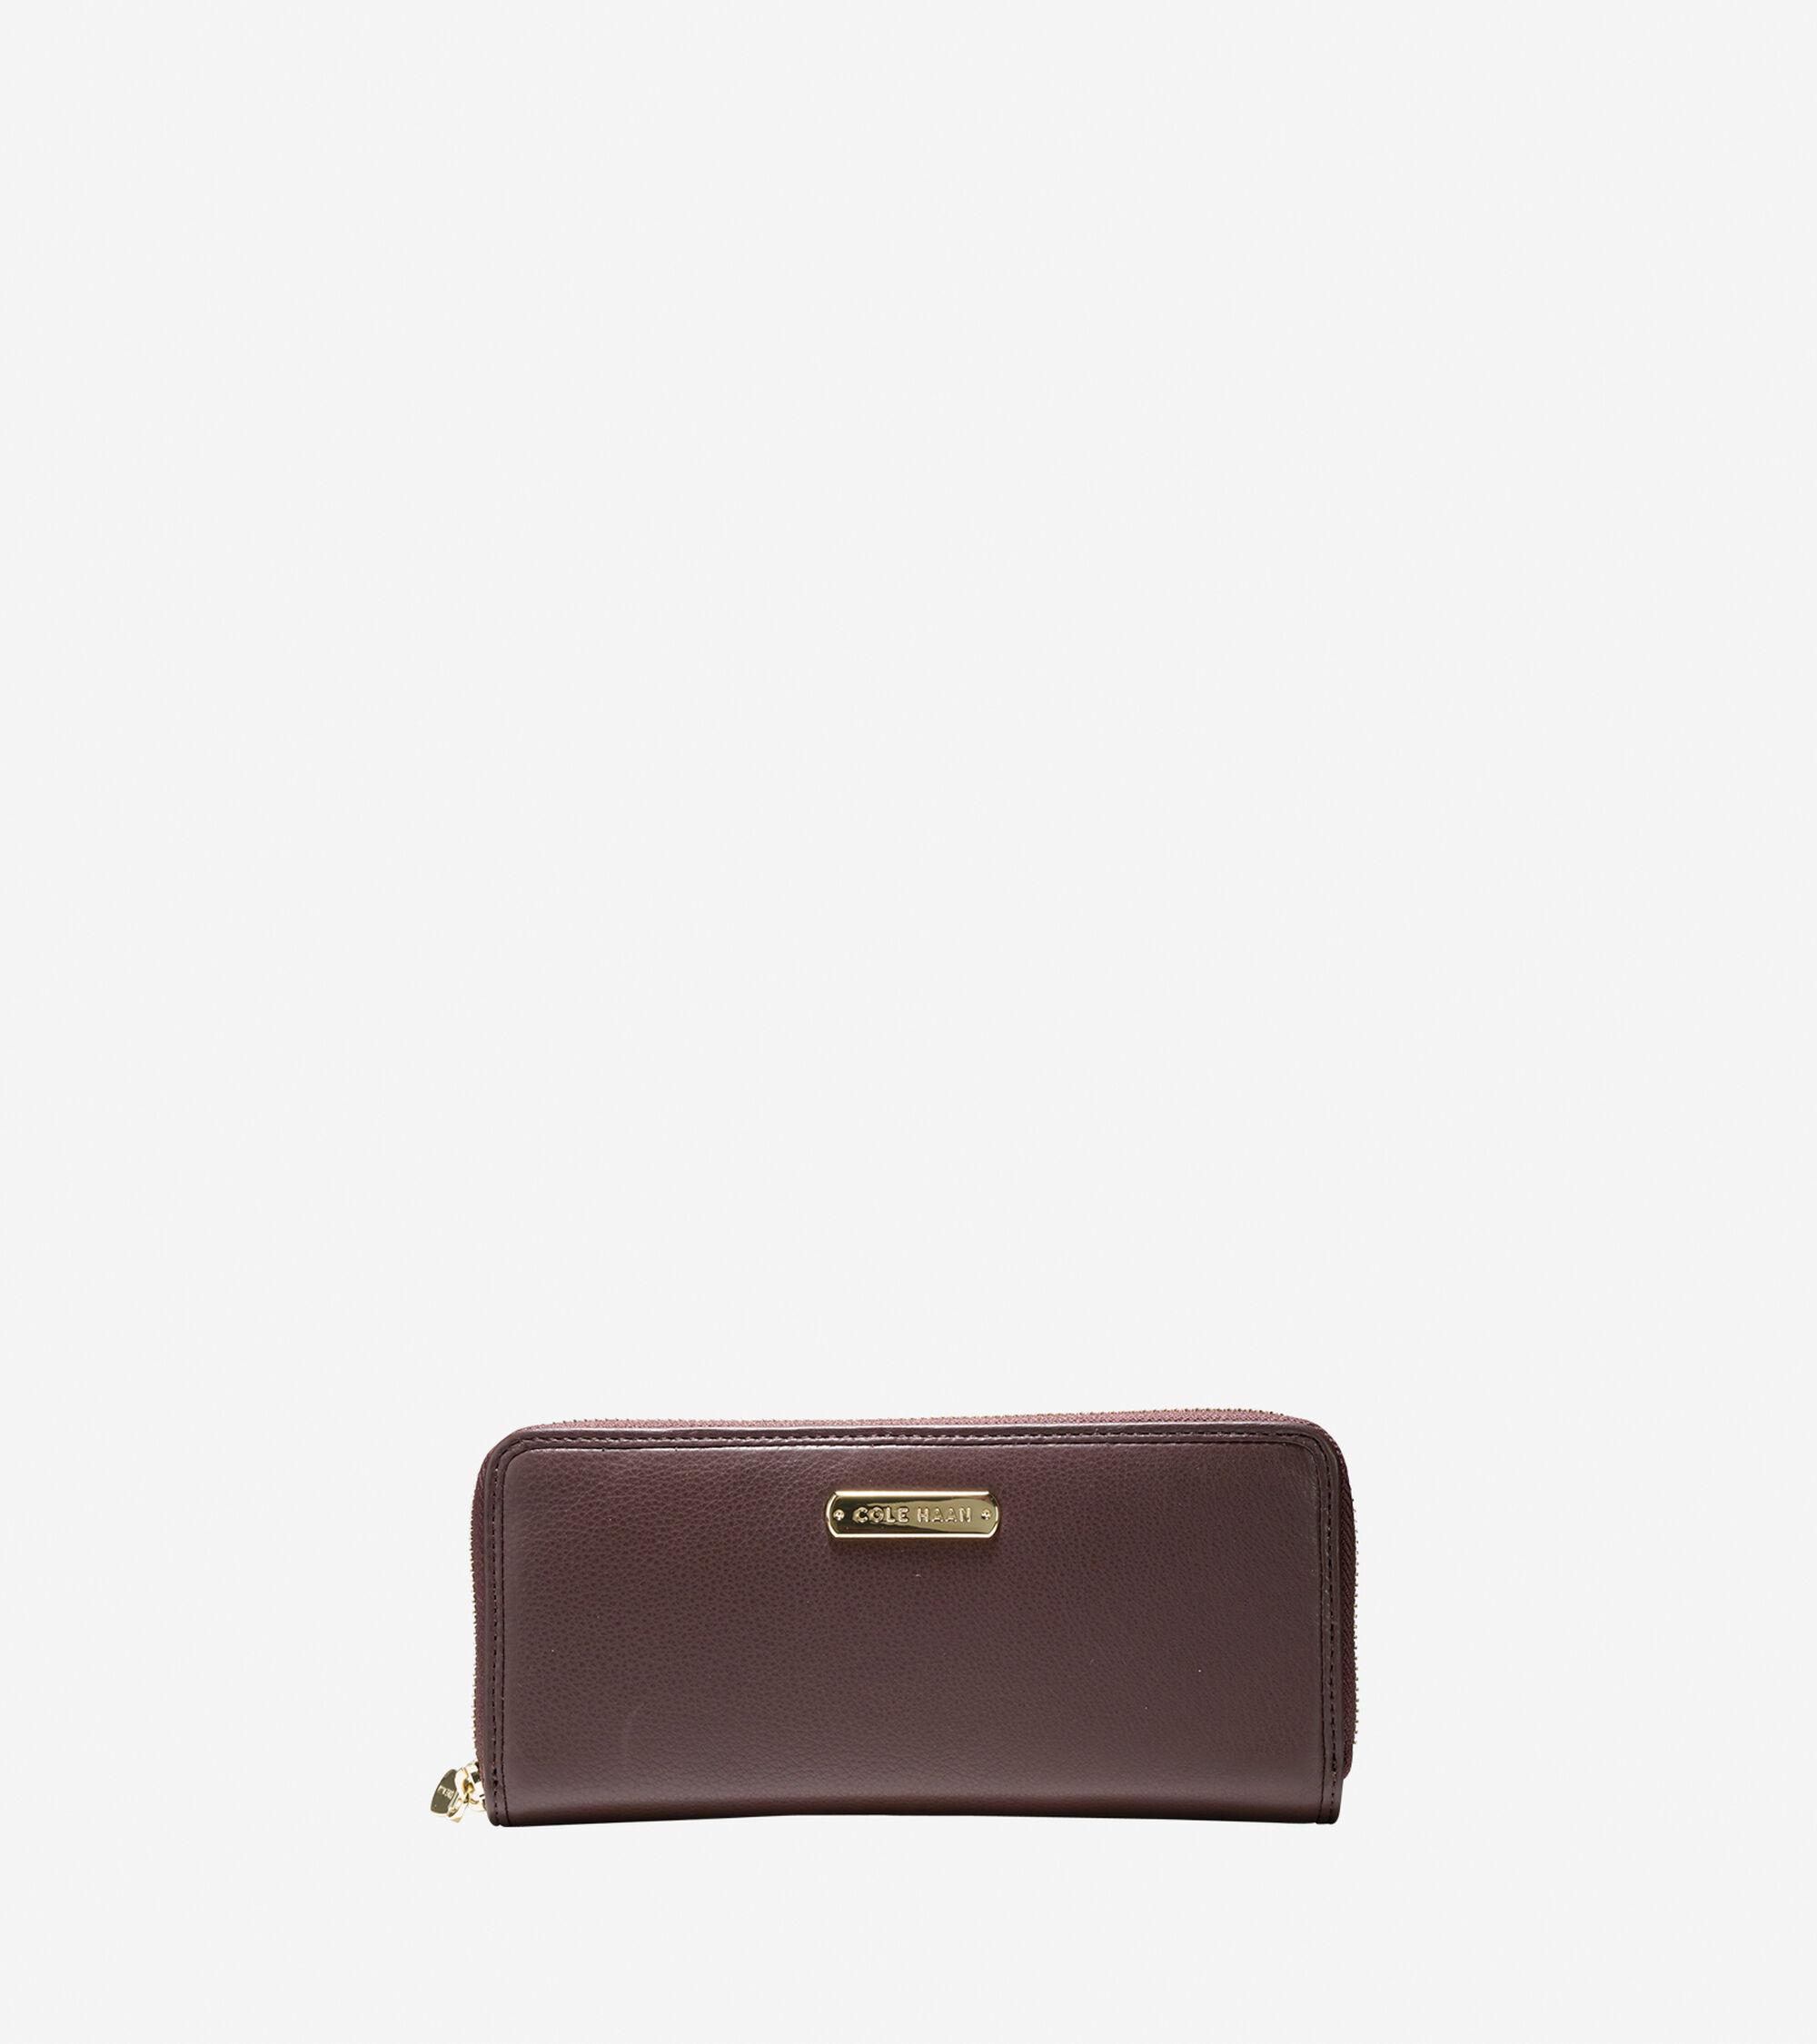 Accessories > Copley Large Zip Continental Wallet